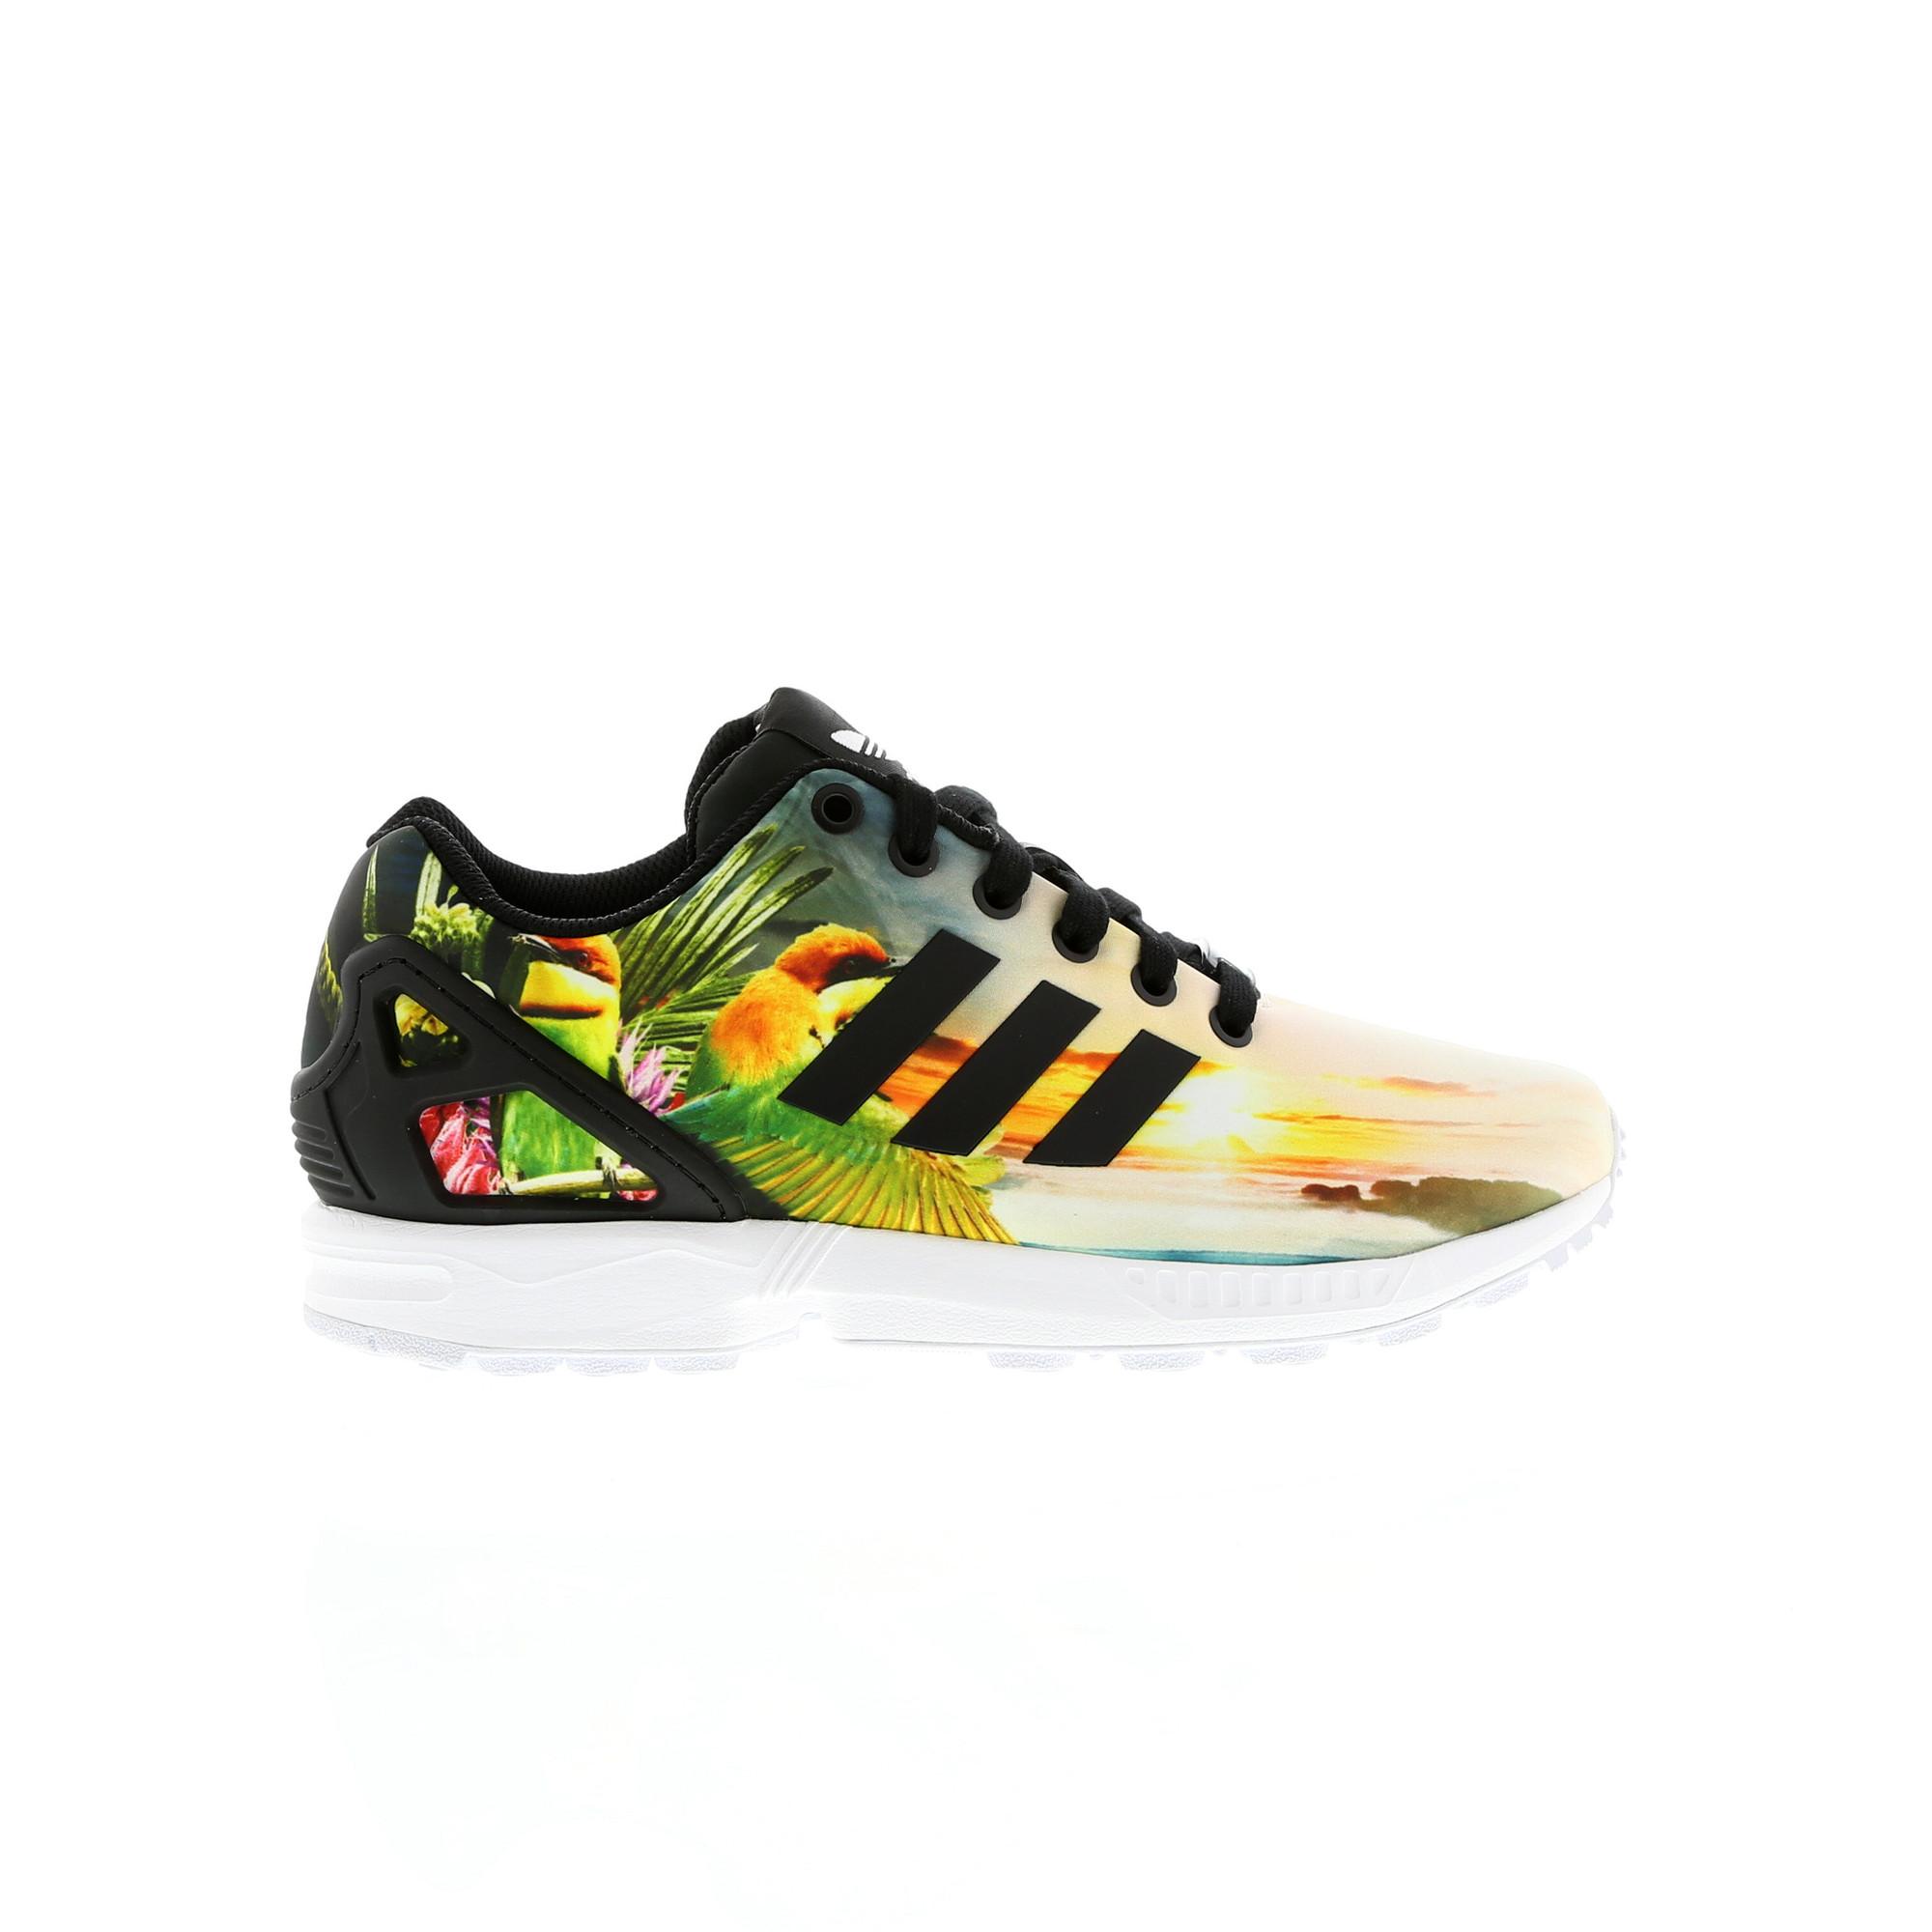 RS85897_Foot Locker Exclusive_adidas ZX Flux Farm Tropical, Men_5243643202-1-lpr